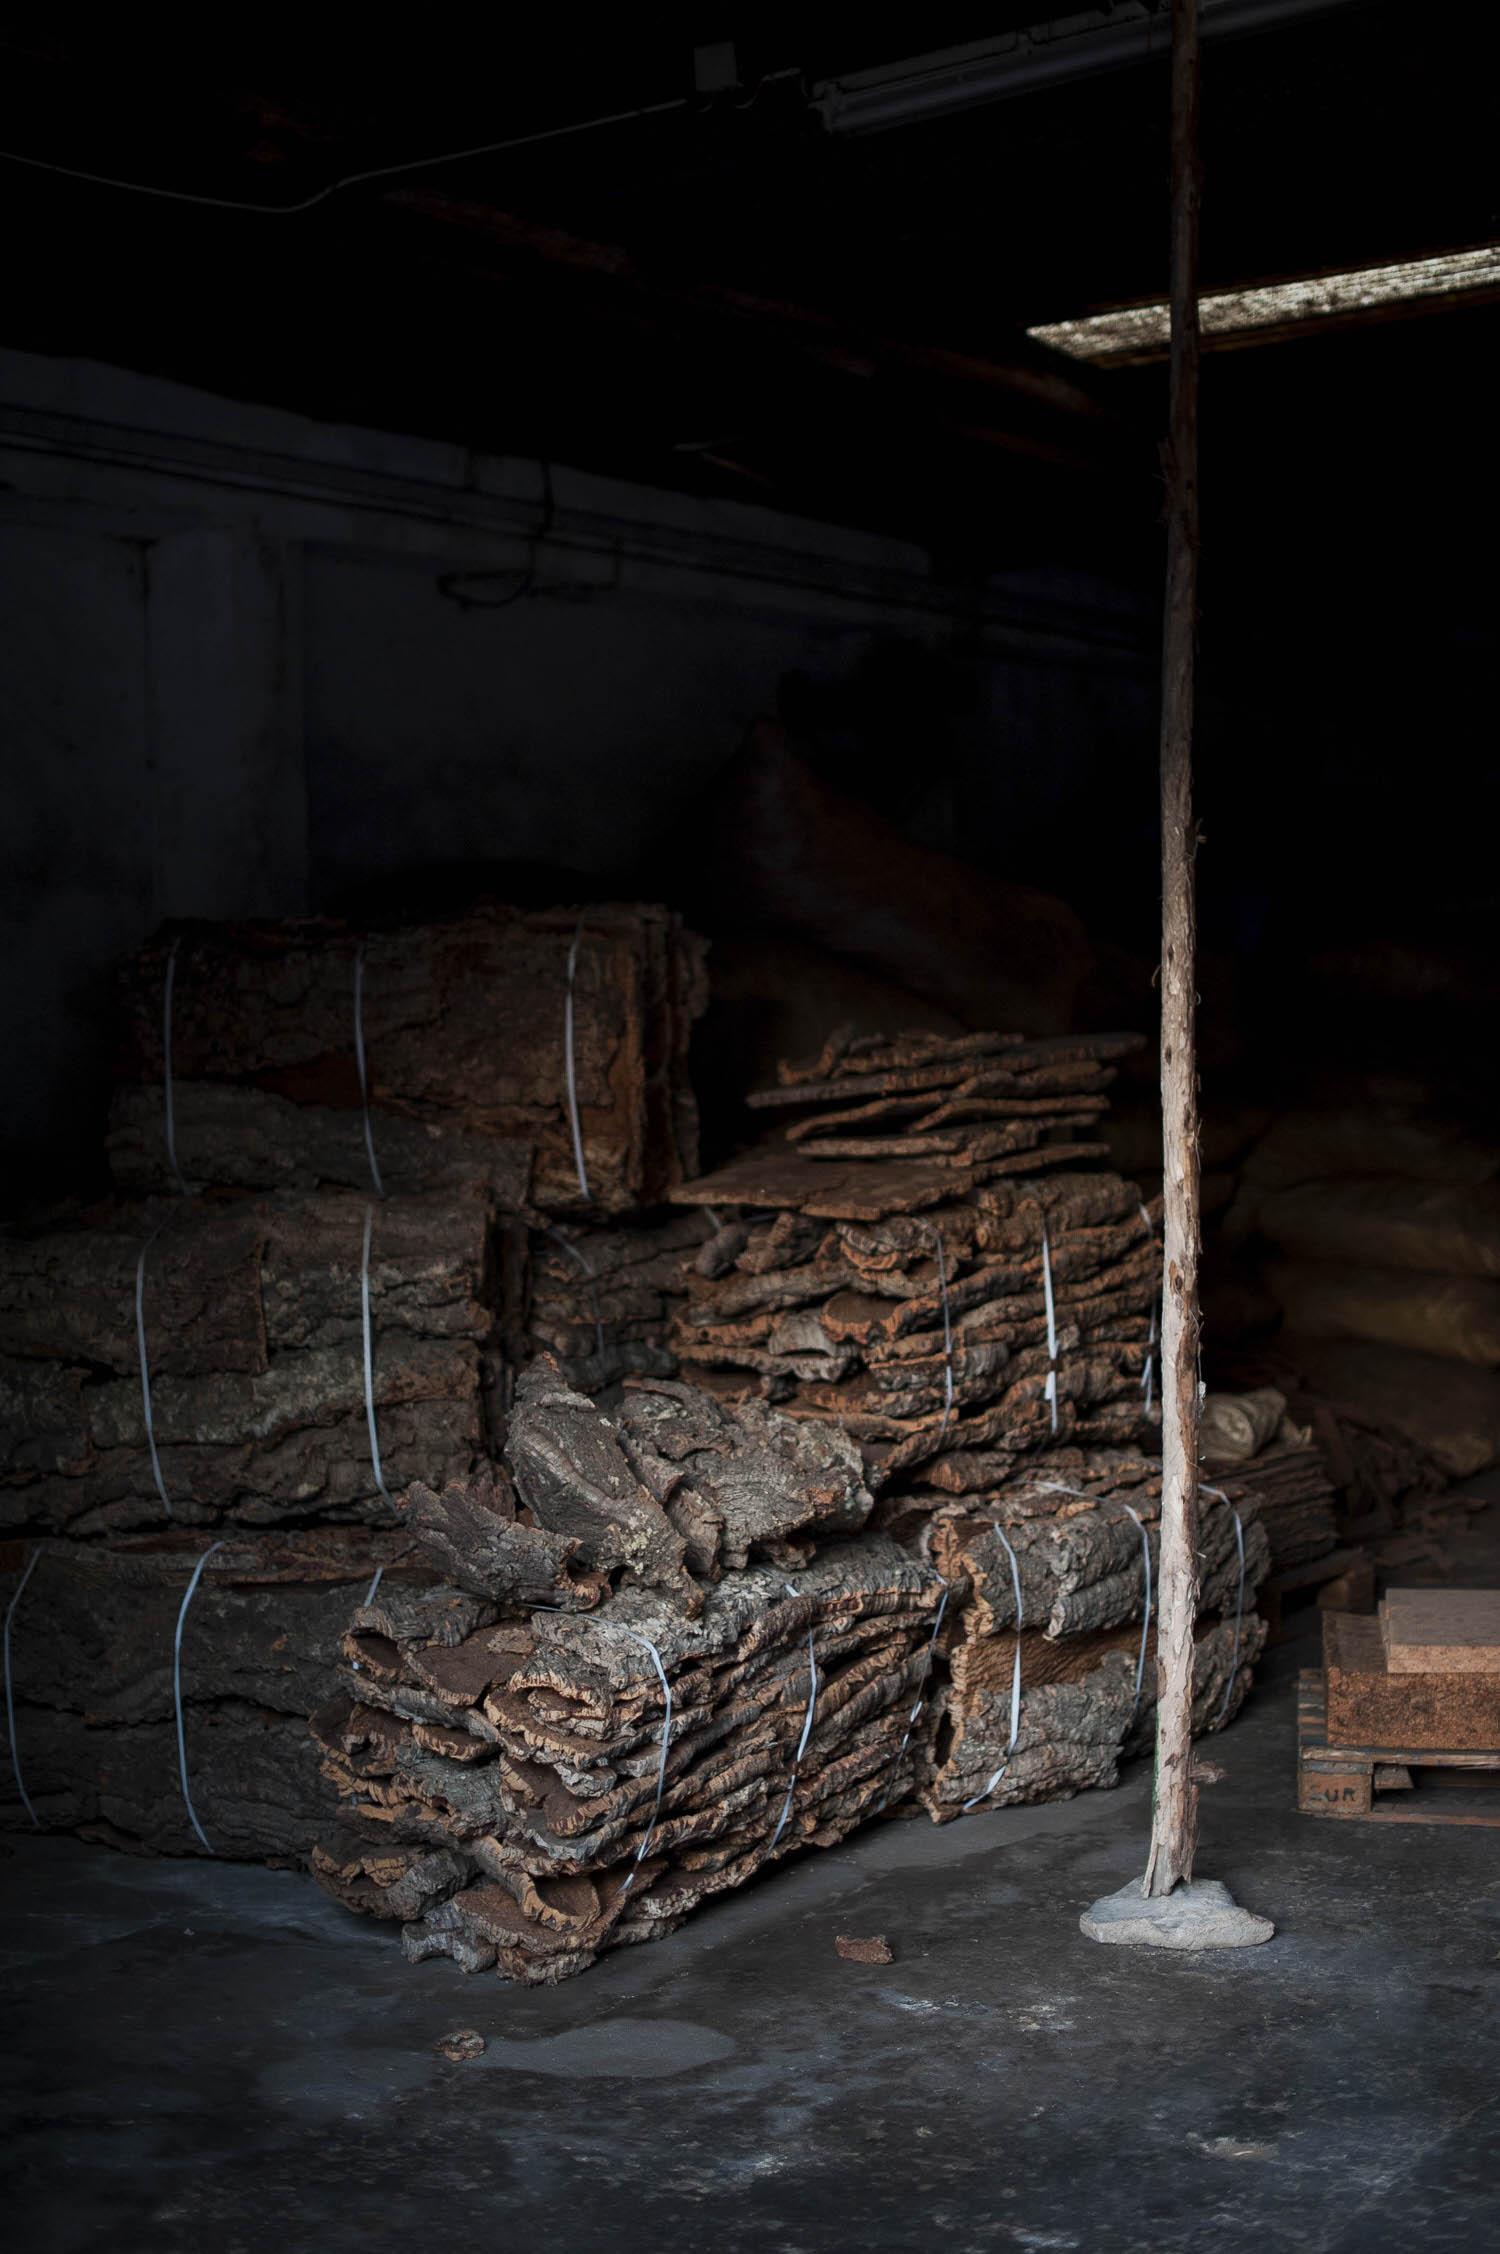 Noe Duchaufour Lawrance Burnt Cork Exploration Made In Situ Photo Filipa Alves Yellowtrace 22